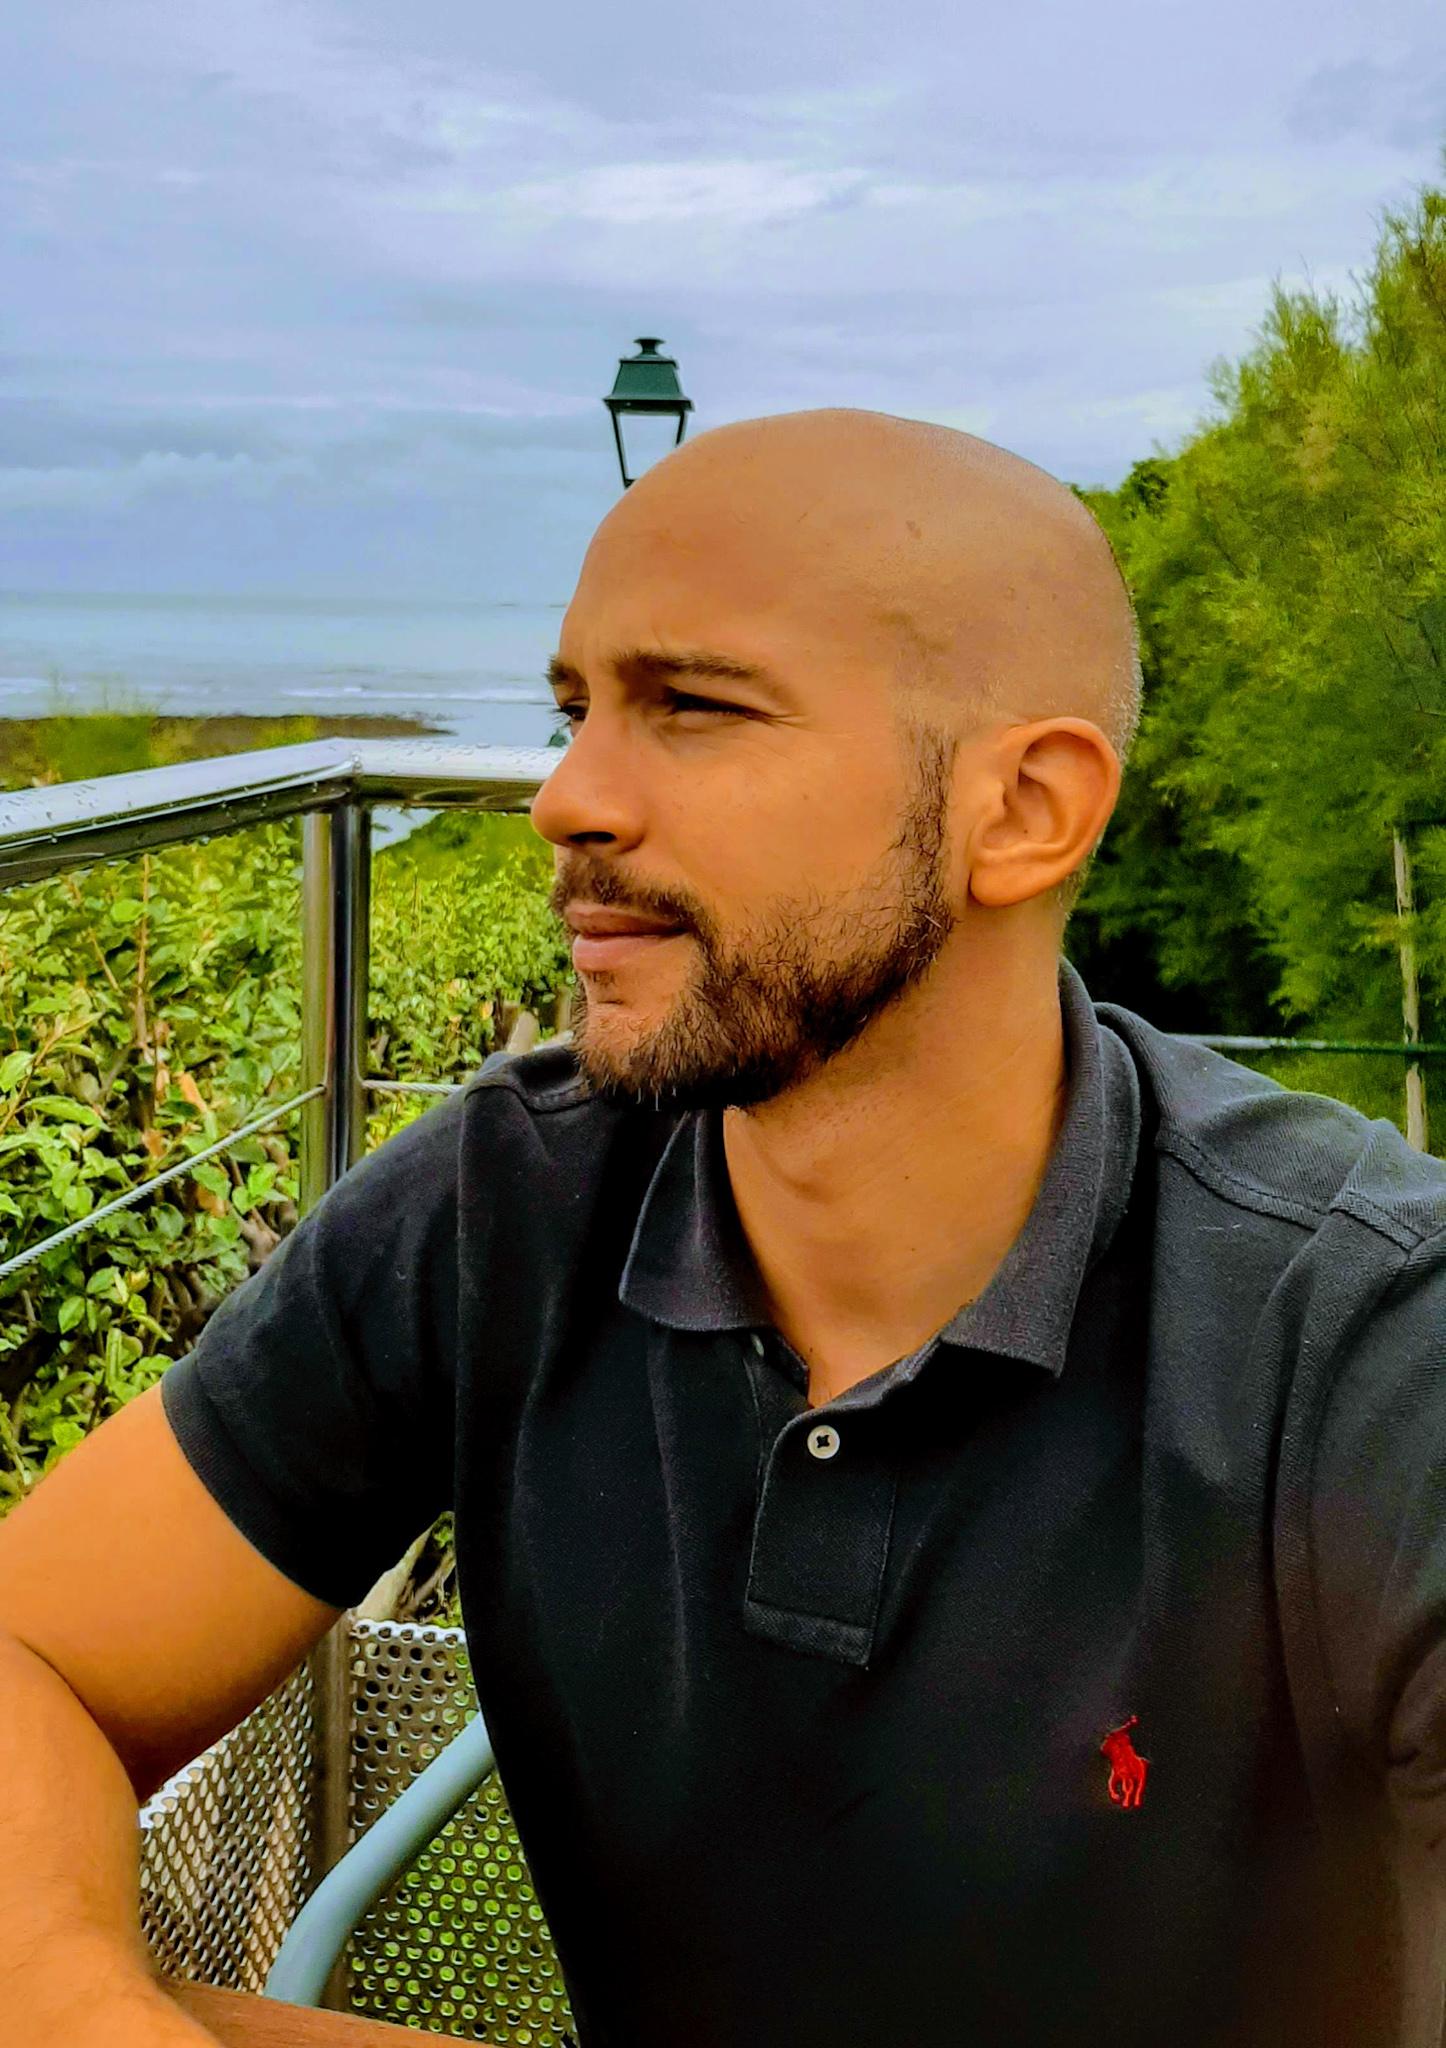 Jonathan Herscovici